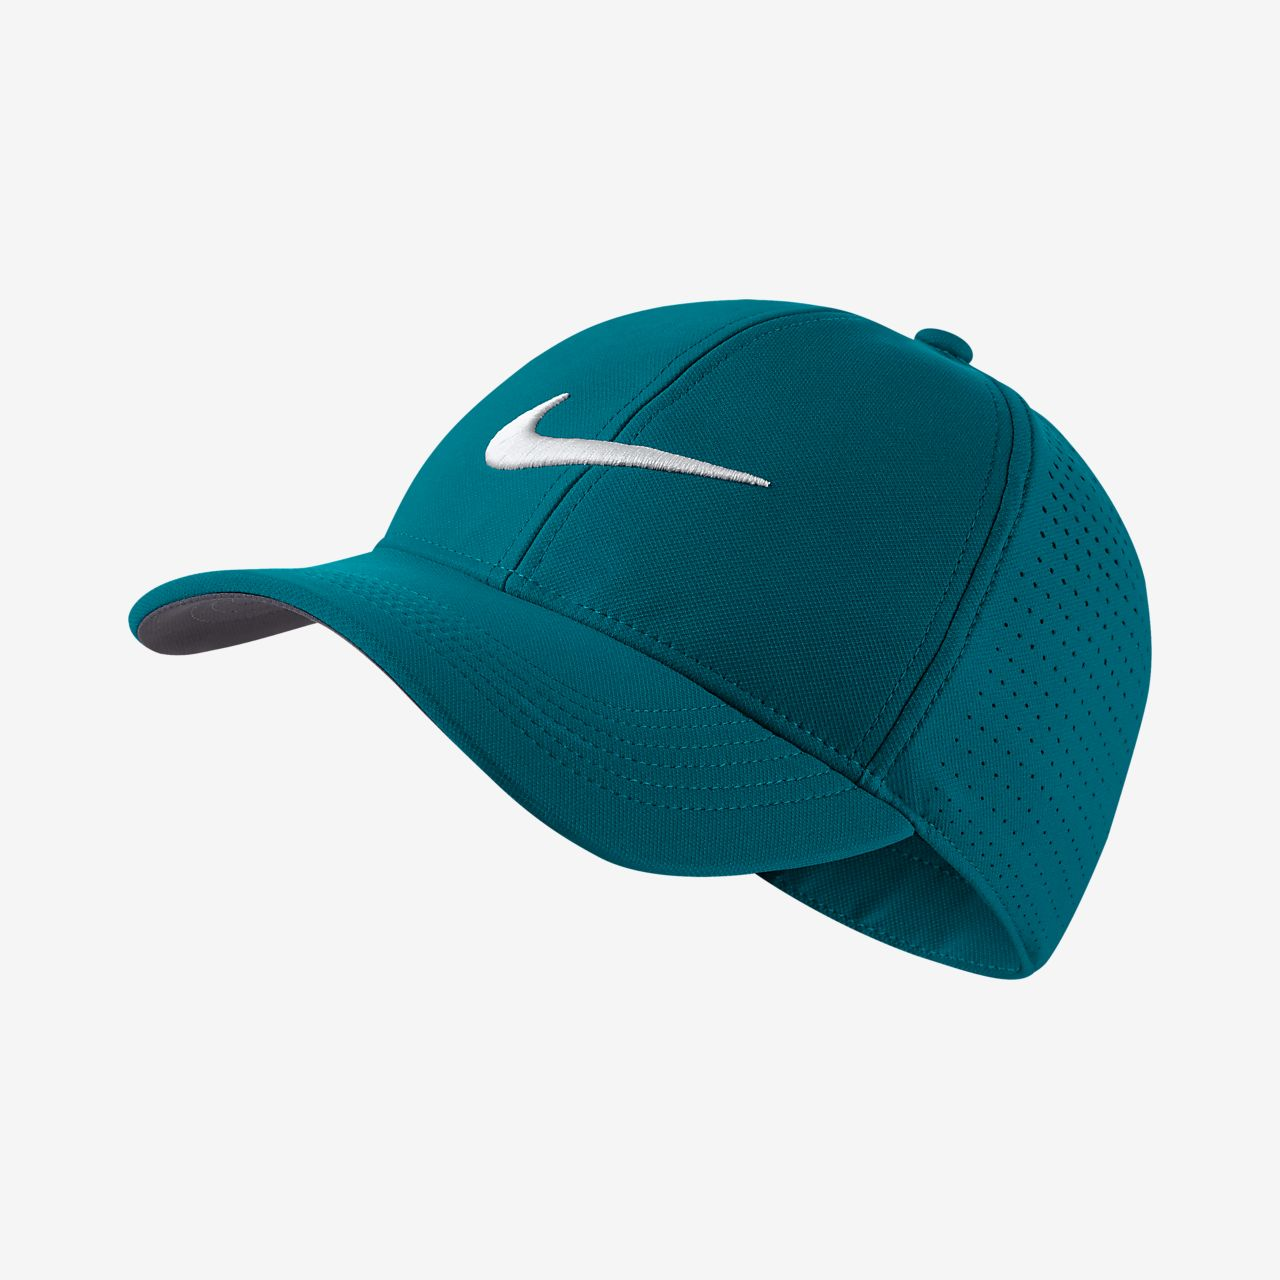 nike adjustable cap